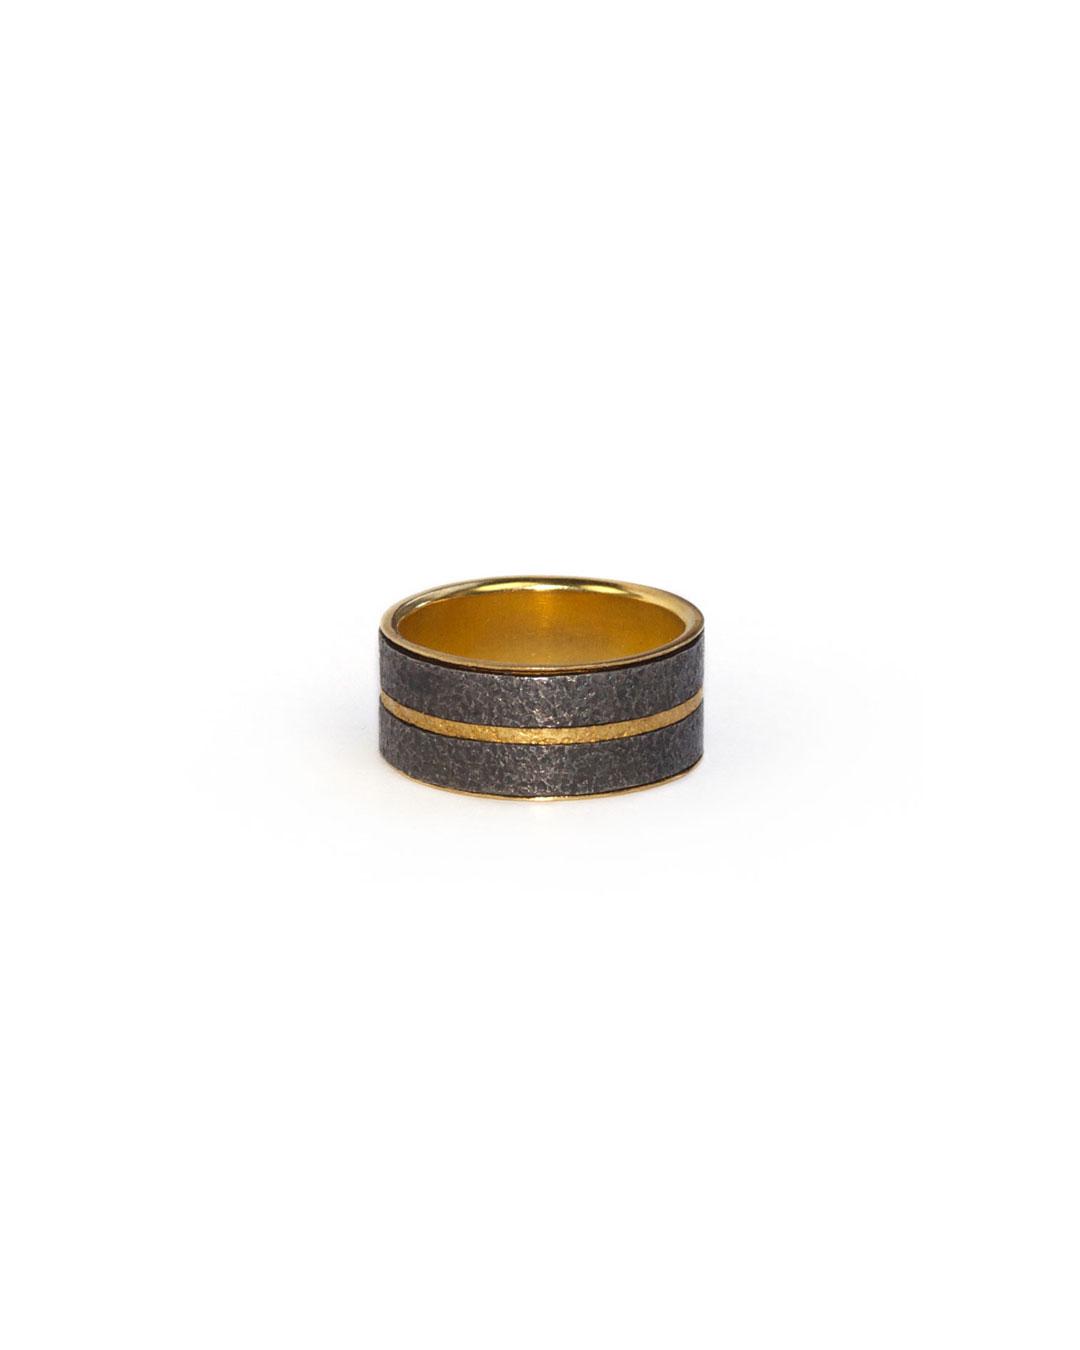 Okinari Kurokawa, untitled, 2008, ring; 20ct gold, silver, 23 x 9 mm